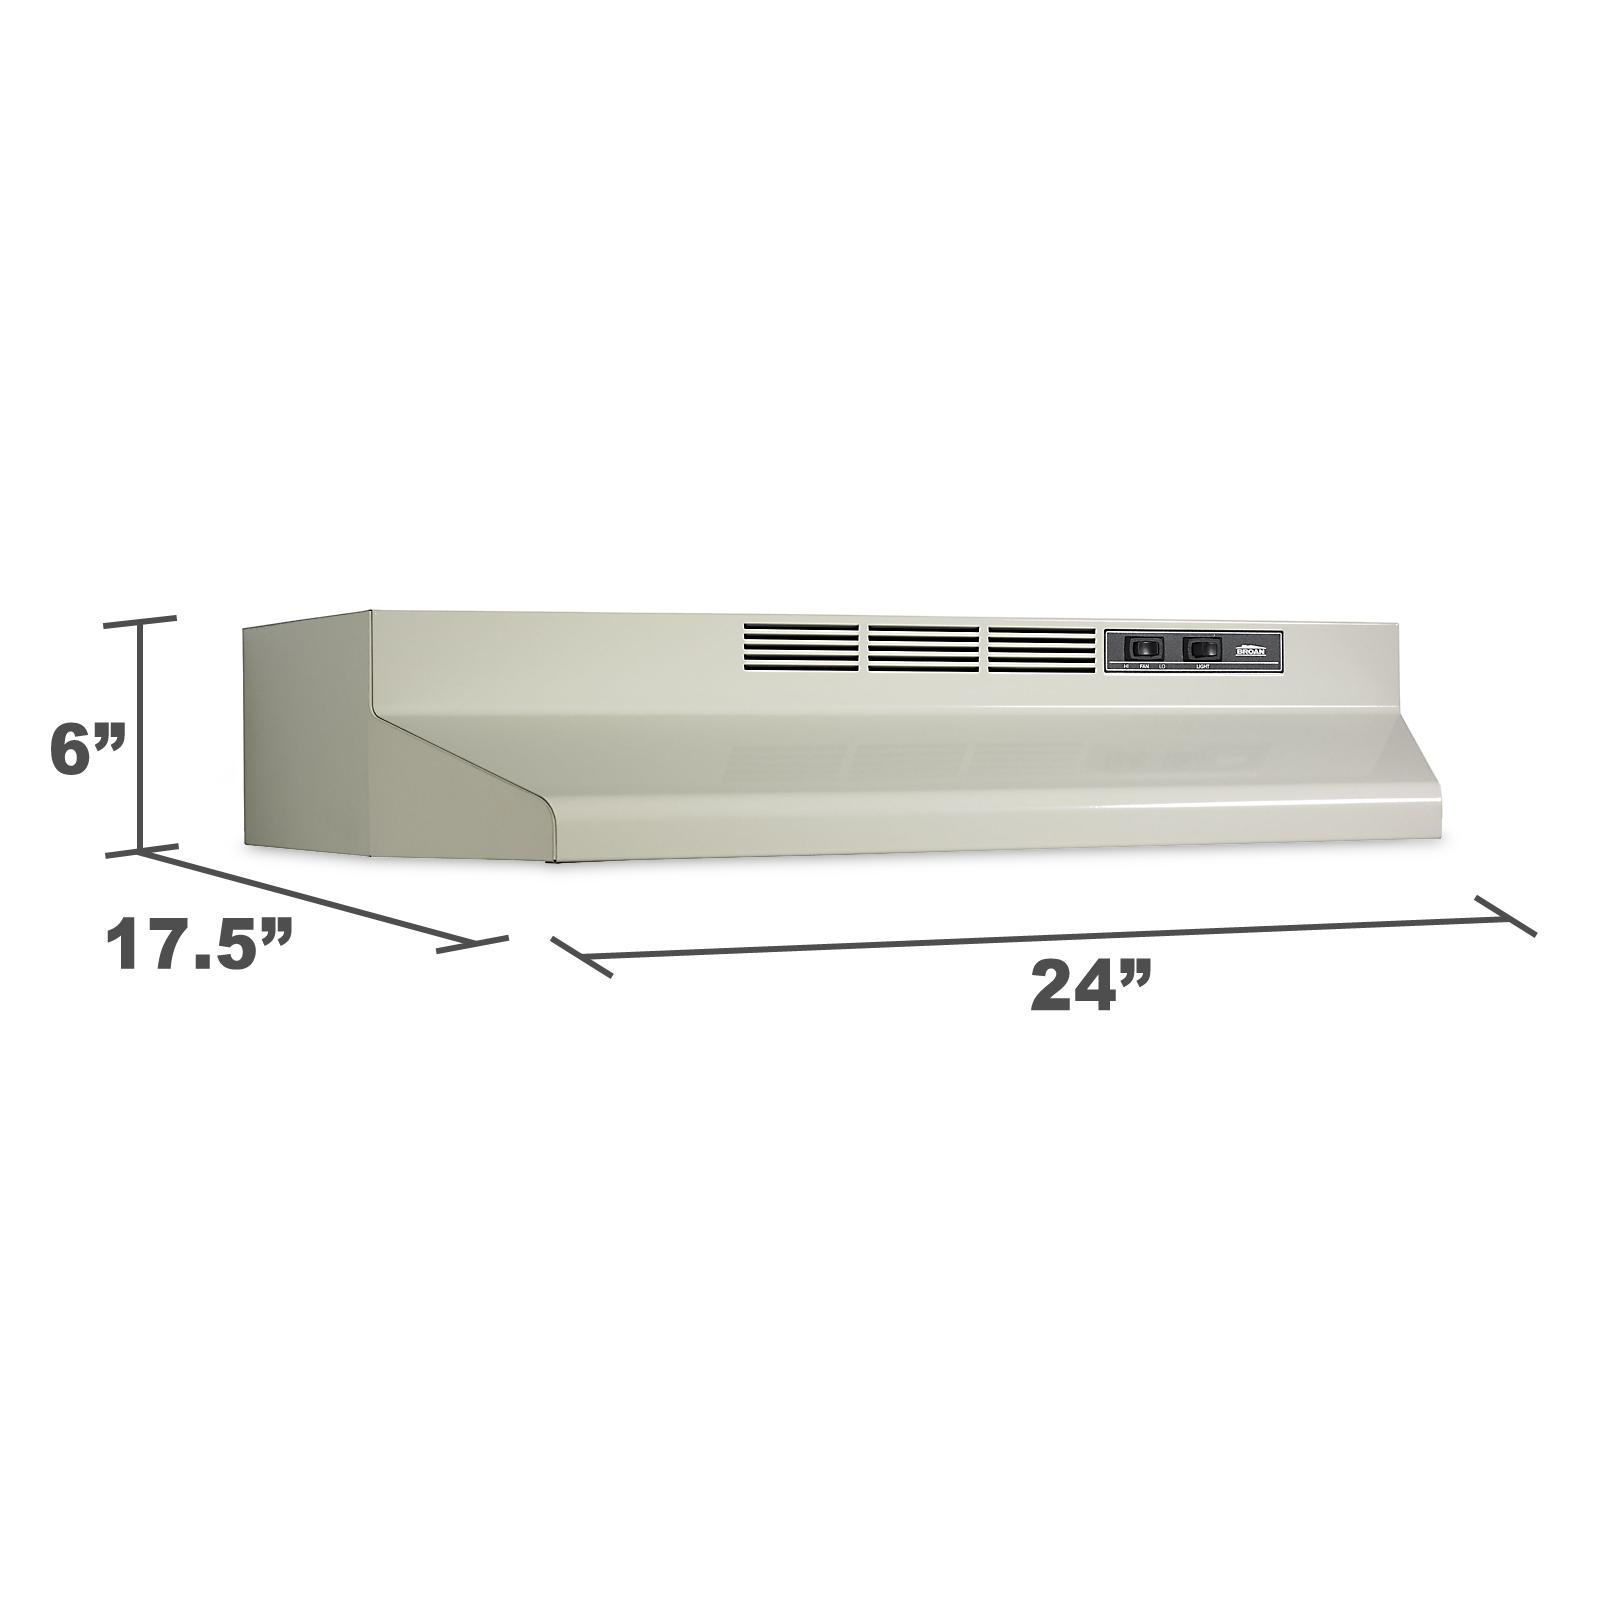 "Kenmore 24"" Convertible Range Hood  - White 50944"